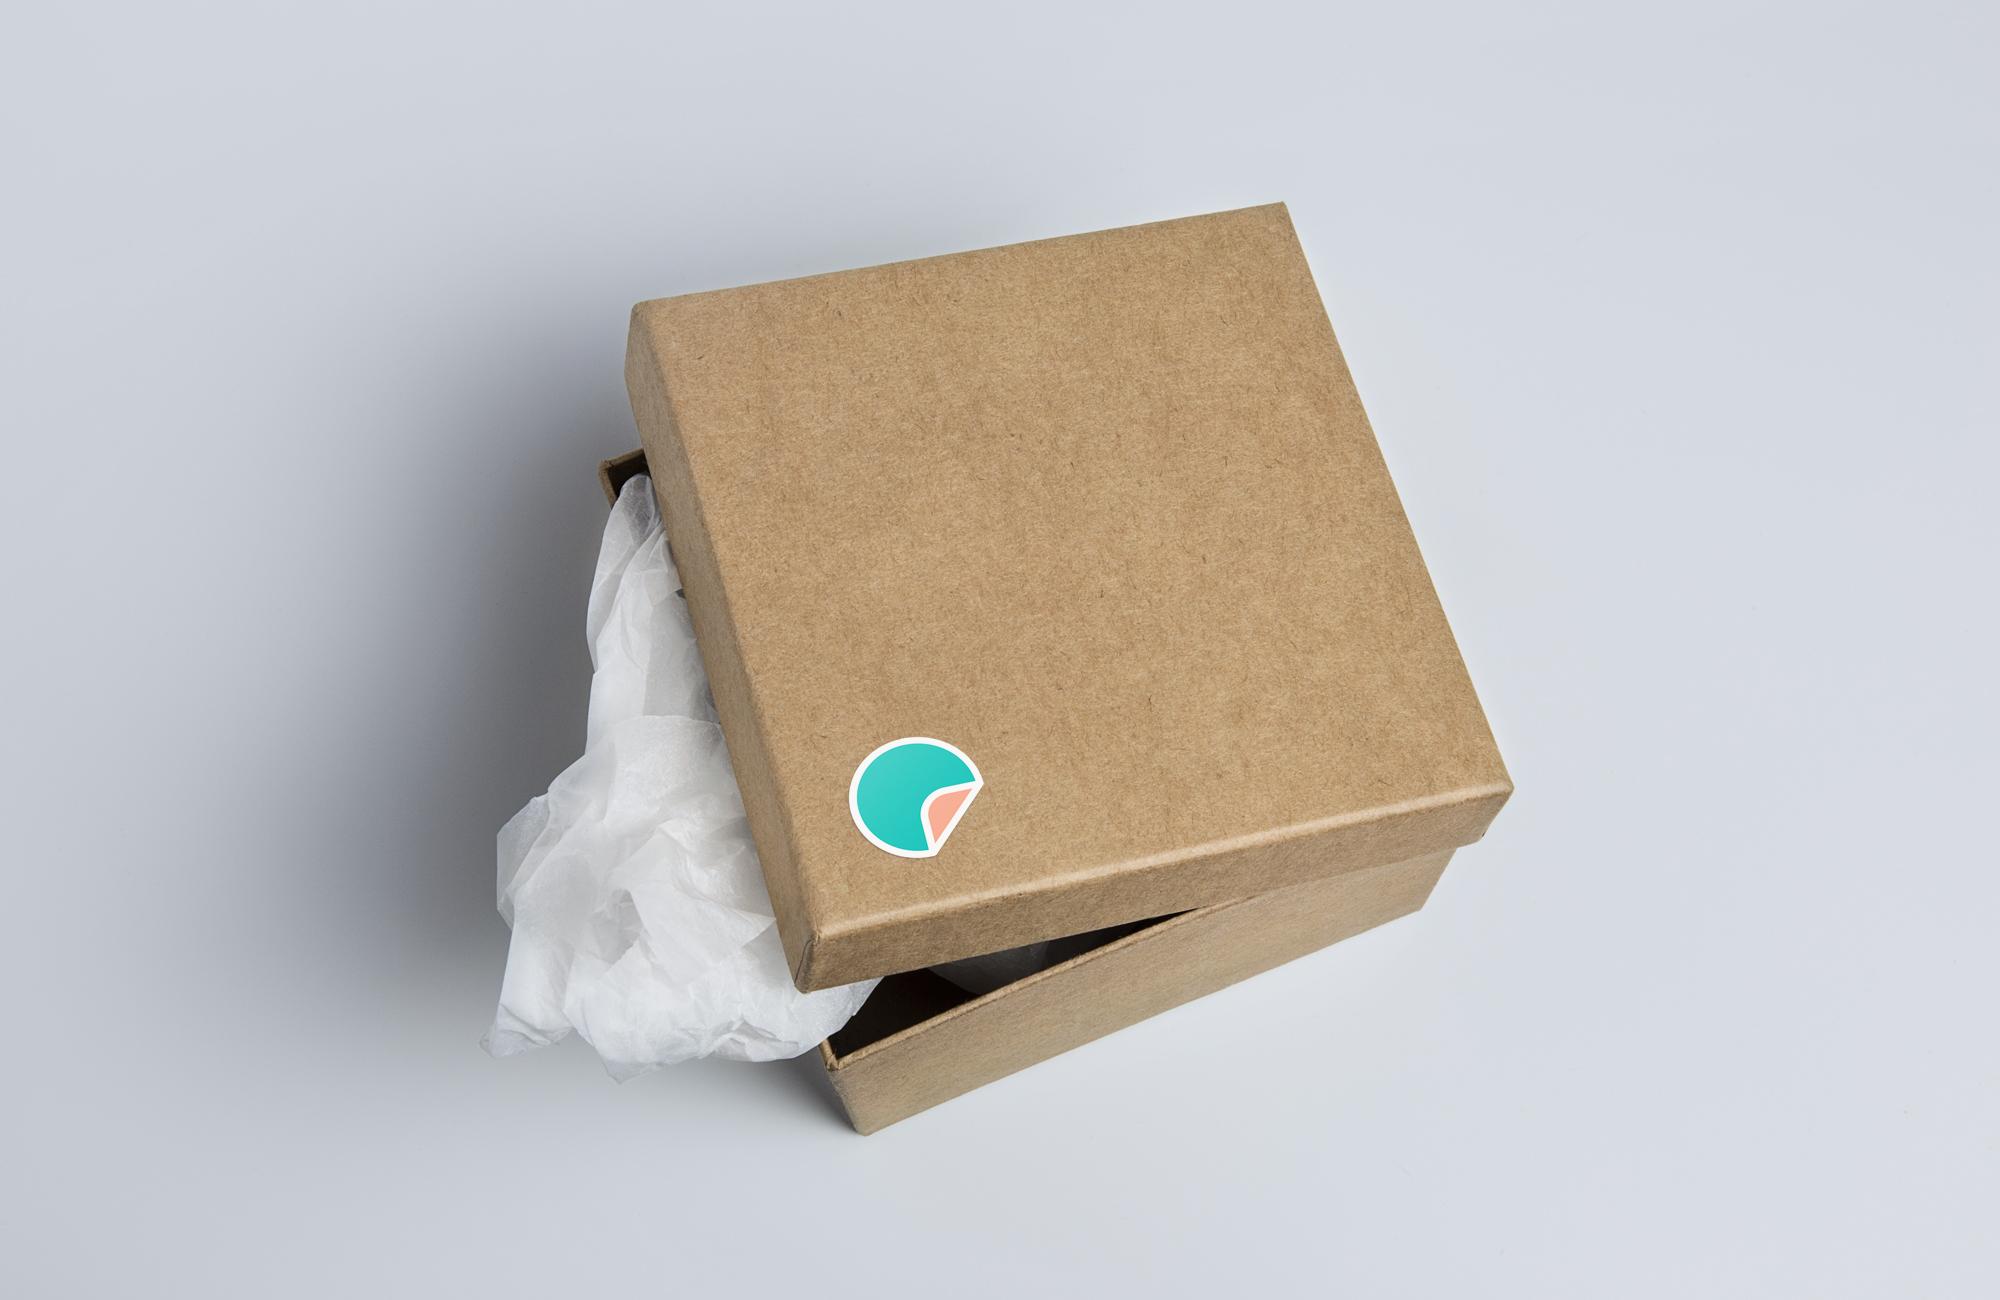 caicus_boxbranding